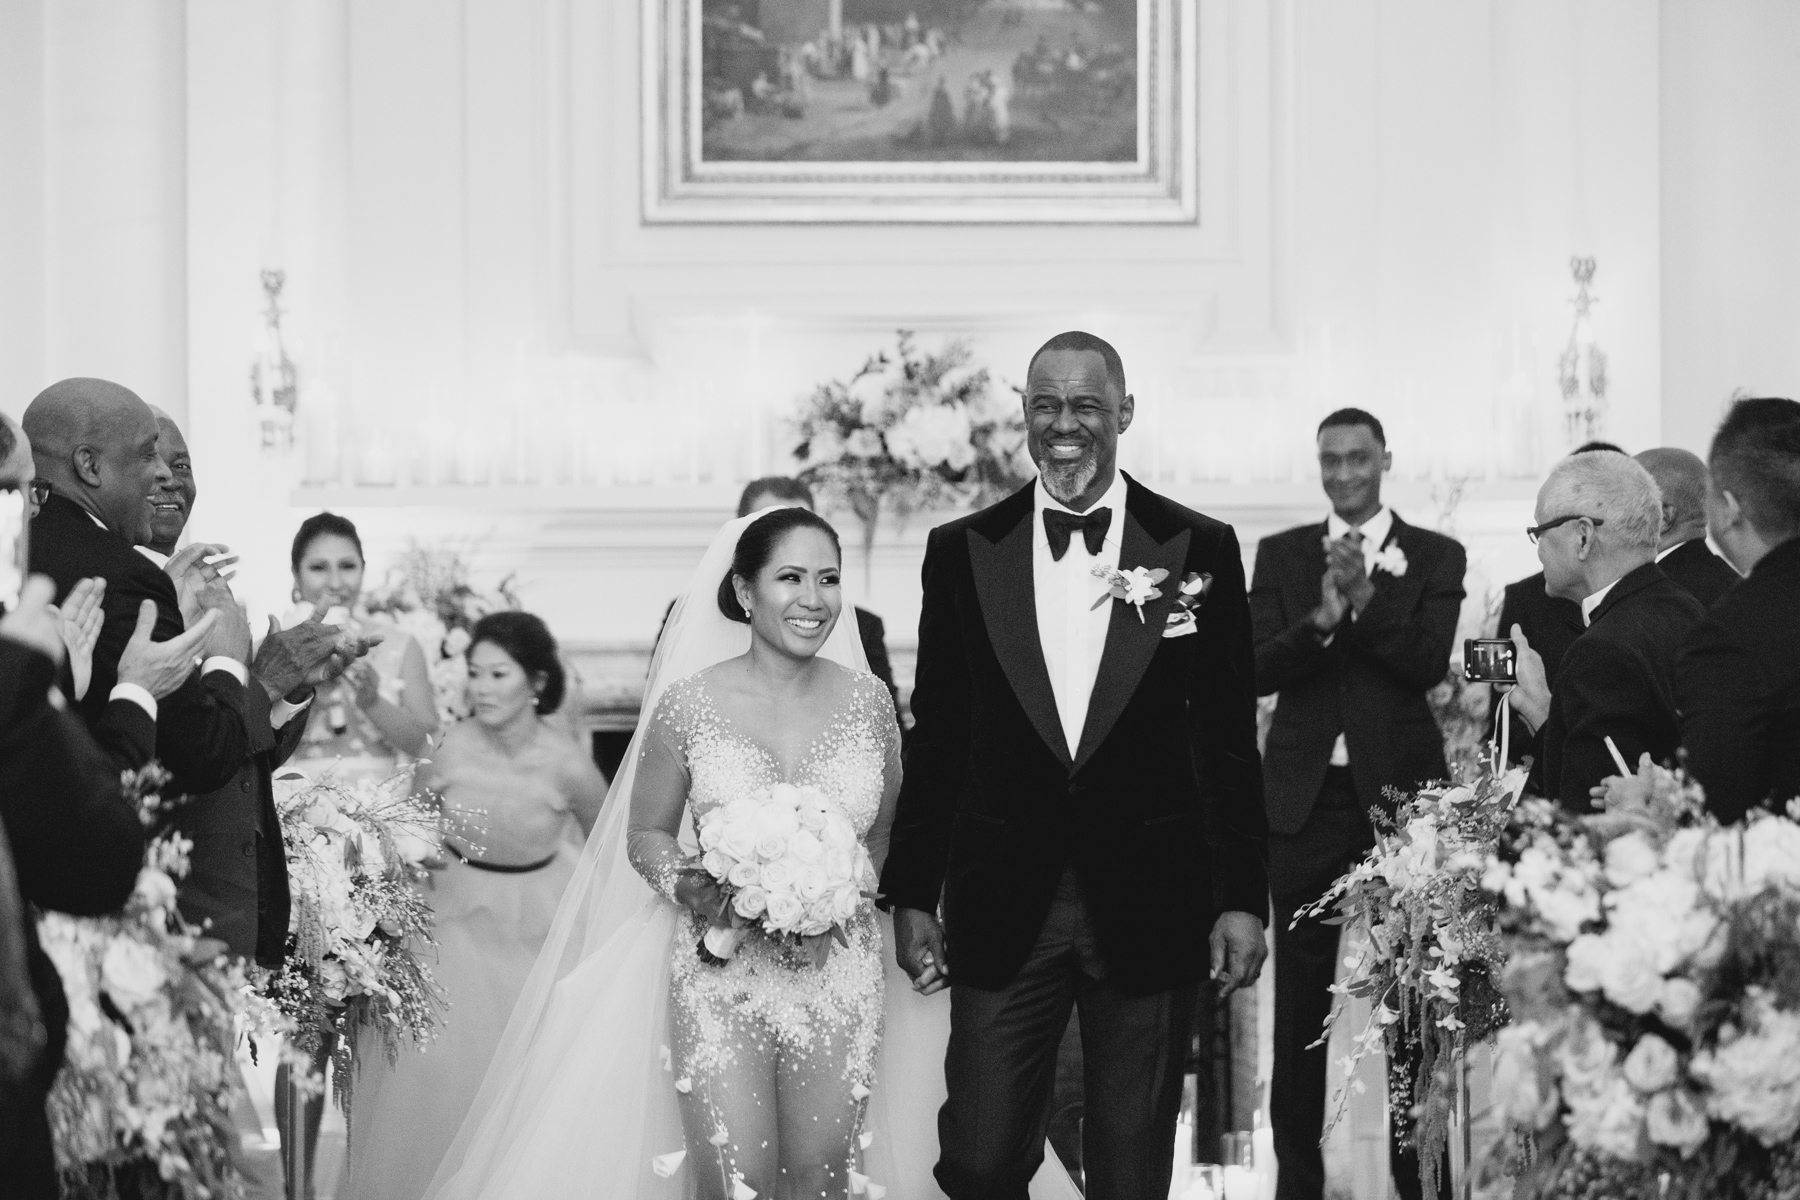 Brian-McKnight-oheka-castle-wedding-88.jpg